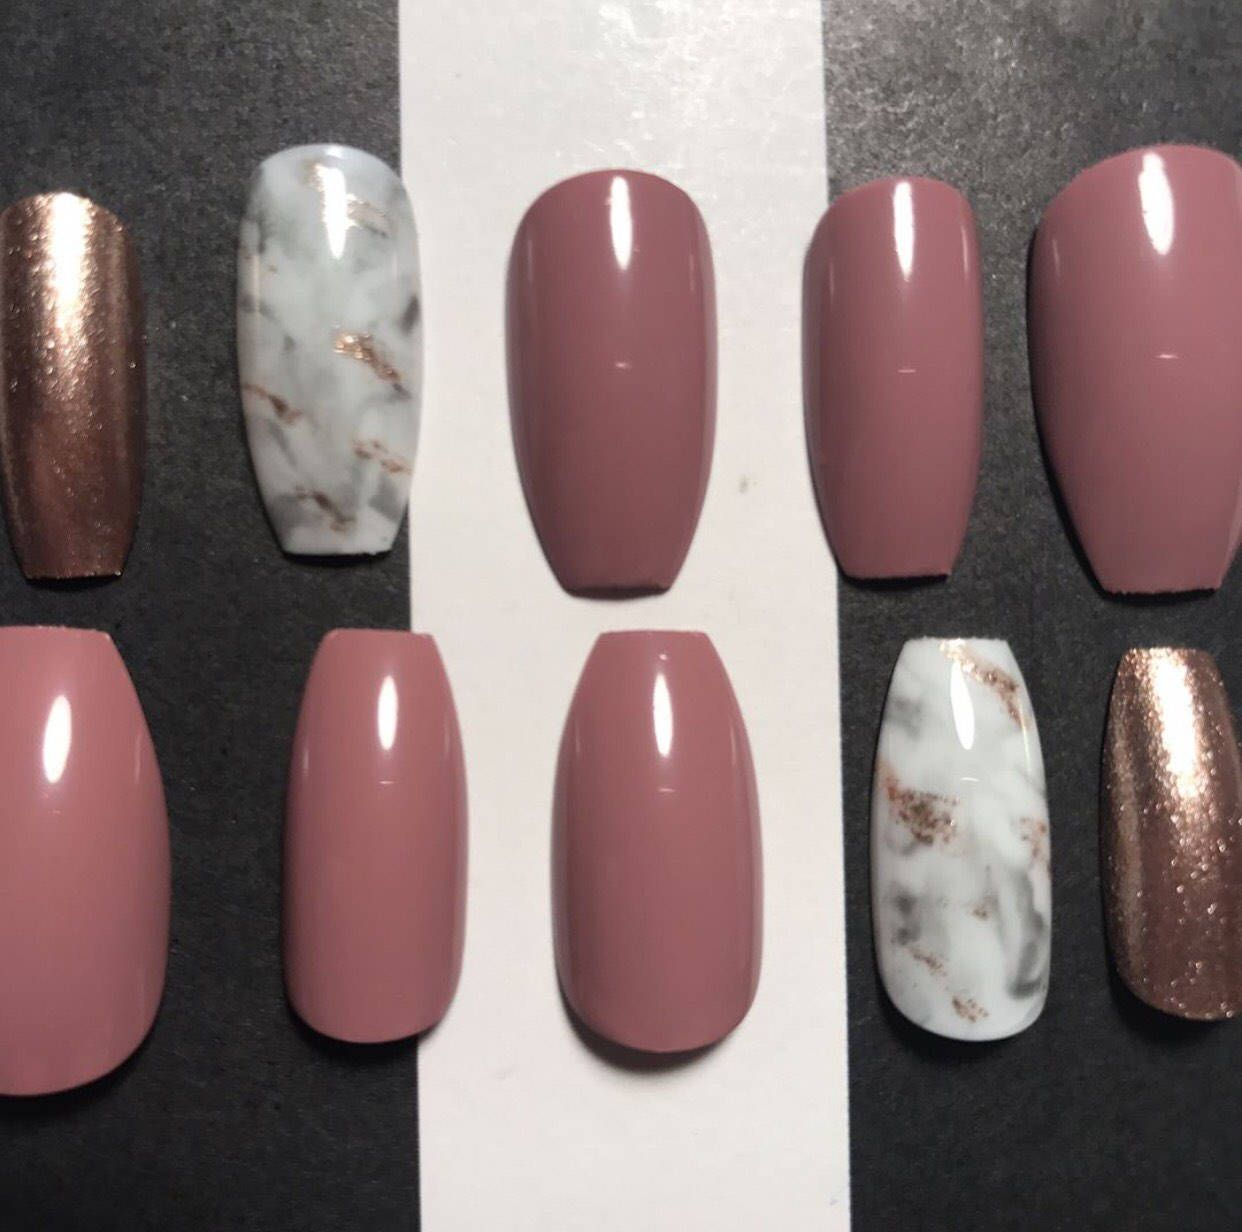 Mauve Marble Rose Gold Press On Nails Glue Fake False By Vixennails Etsy